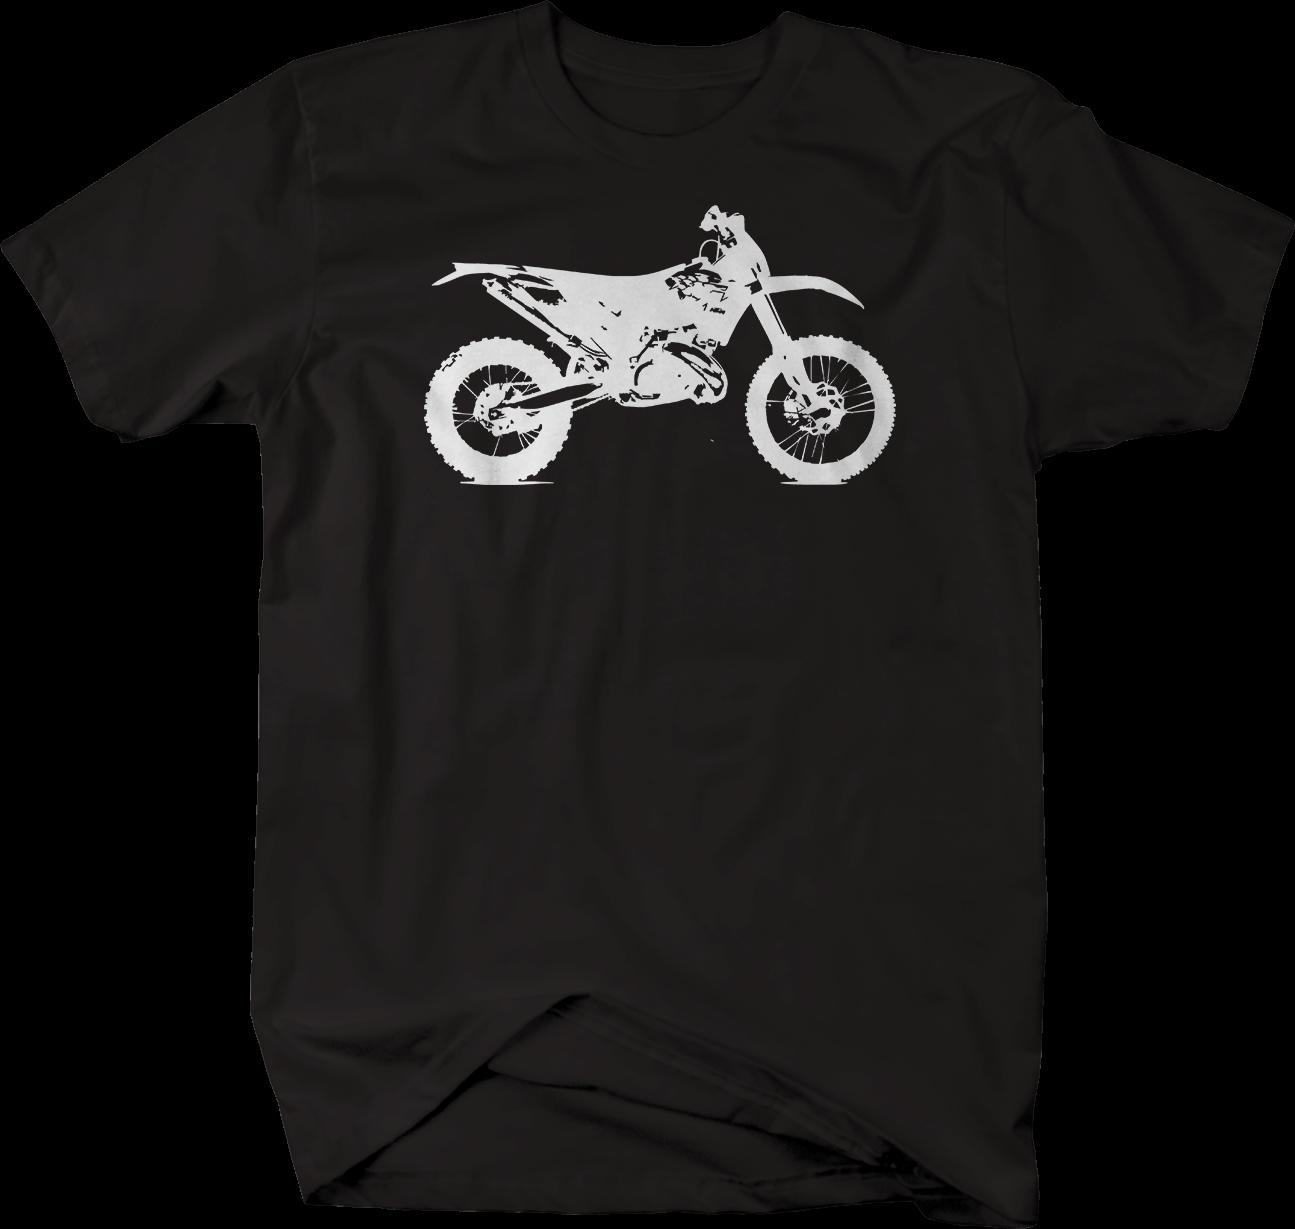 353aecaf7 Dirtbike Motocross Motorcycle Tshirt Short Sleeve Plus Size T Shirt T Shirt  Shop Design Crazy T Shirts Online From Qqq614445917, $16.24| DHgate.Com